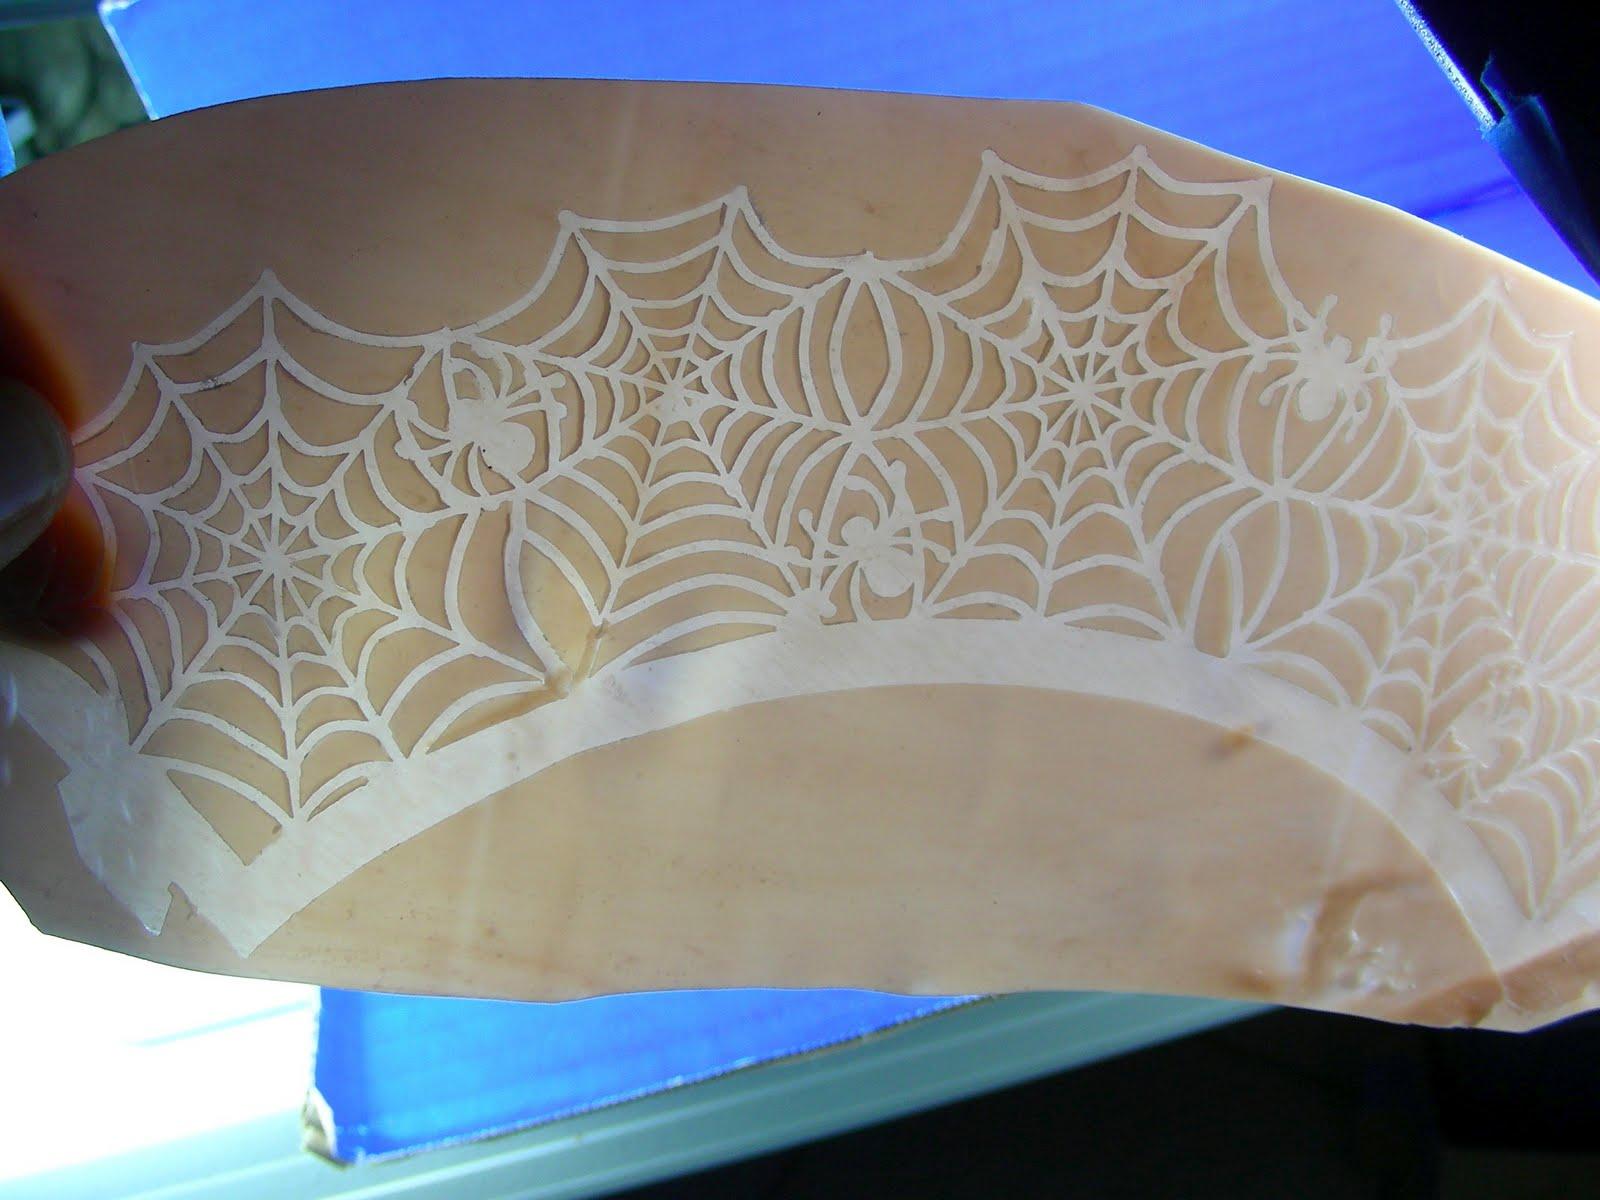 Marlene Brady: Texture Plate from Laser Cut Paper